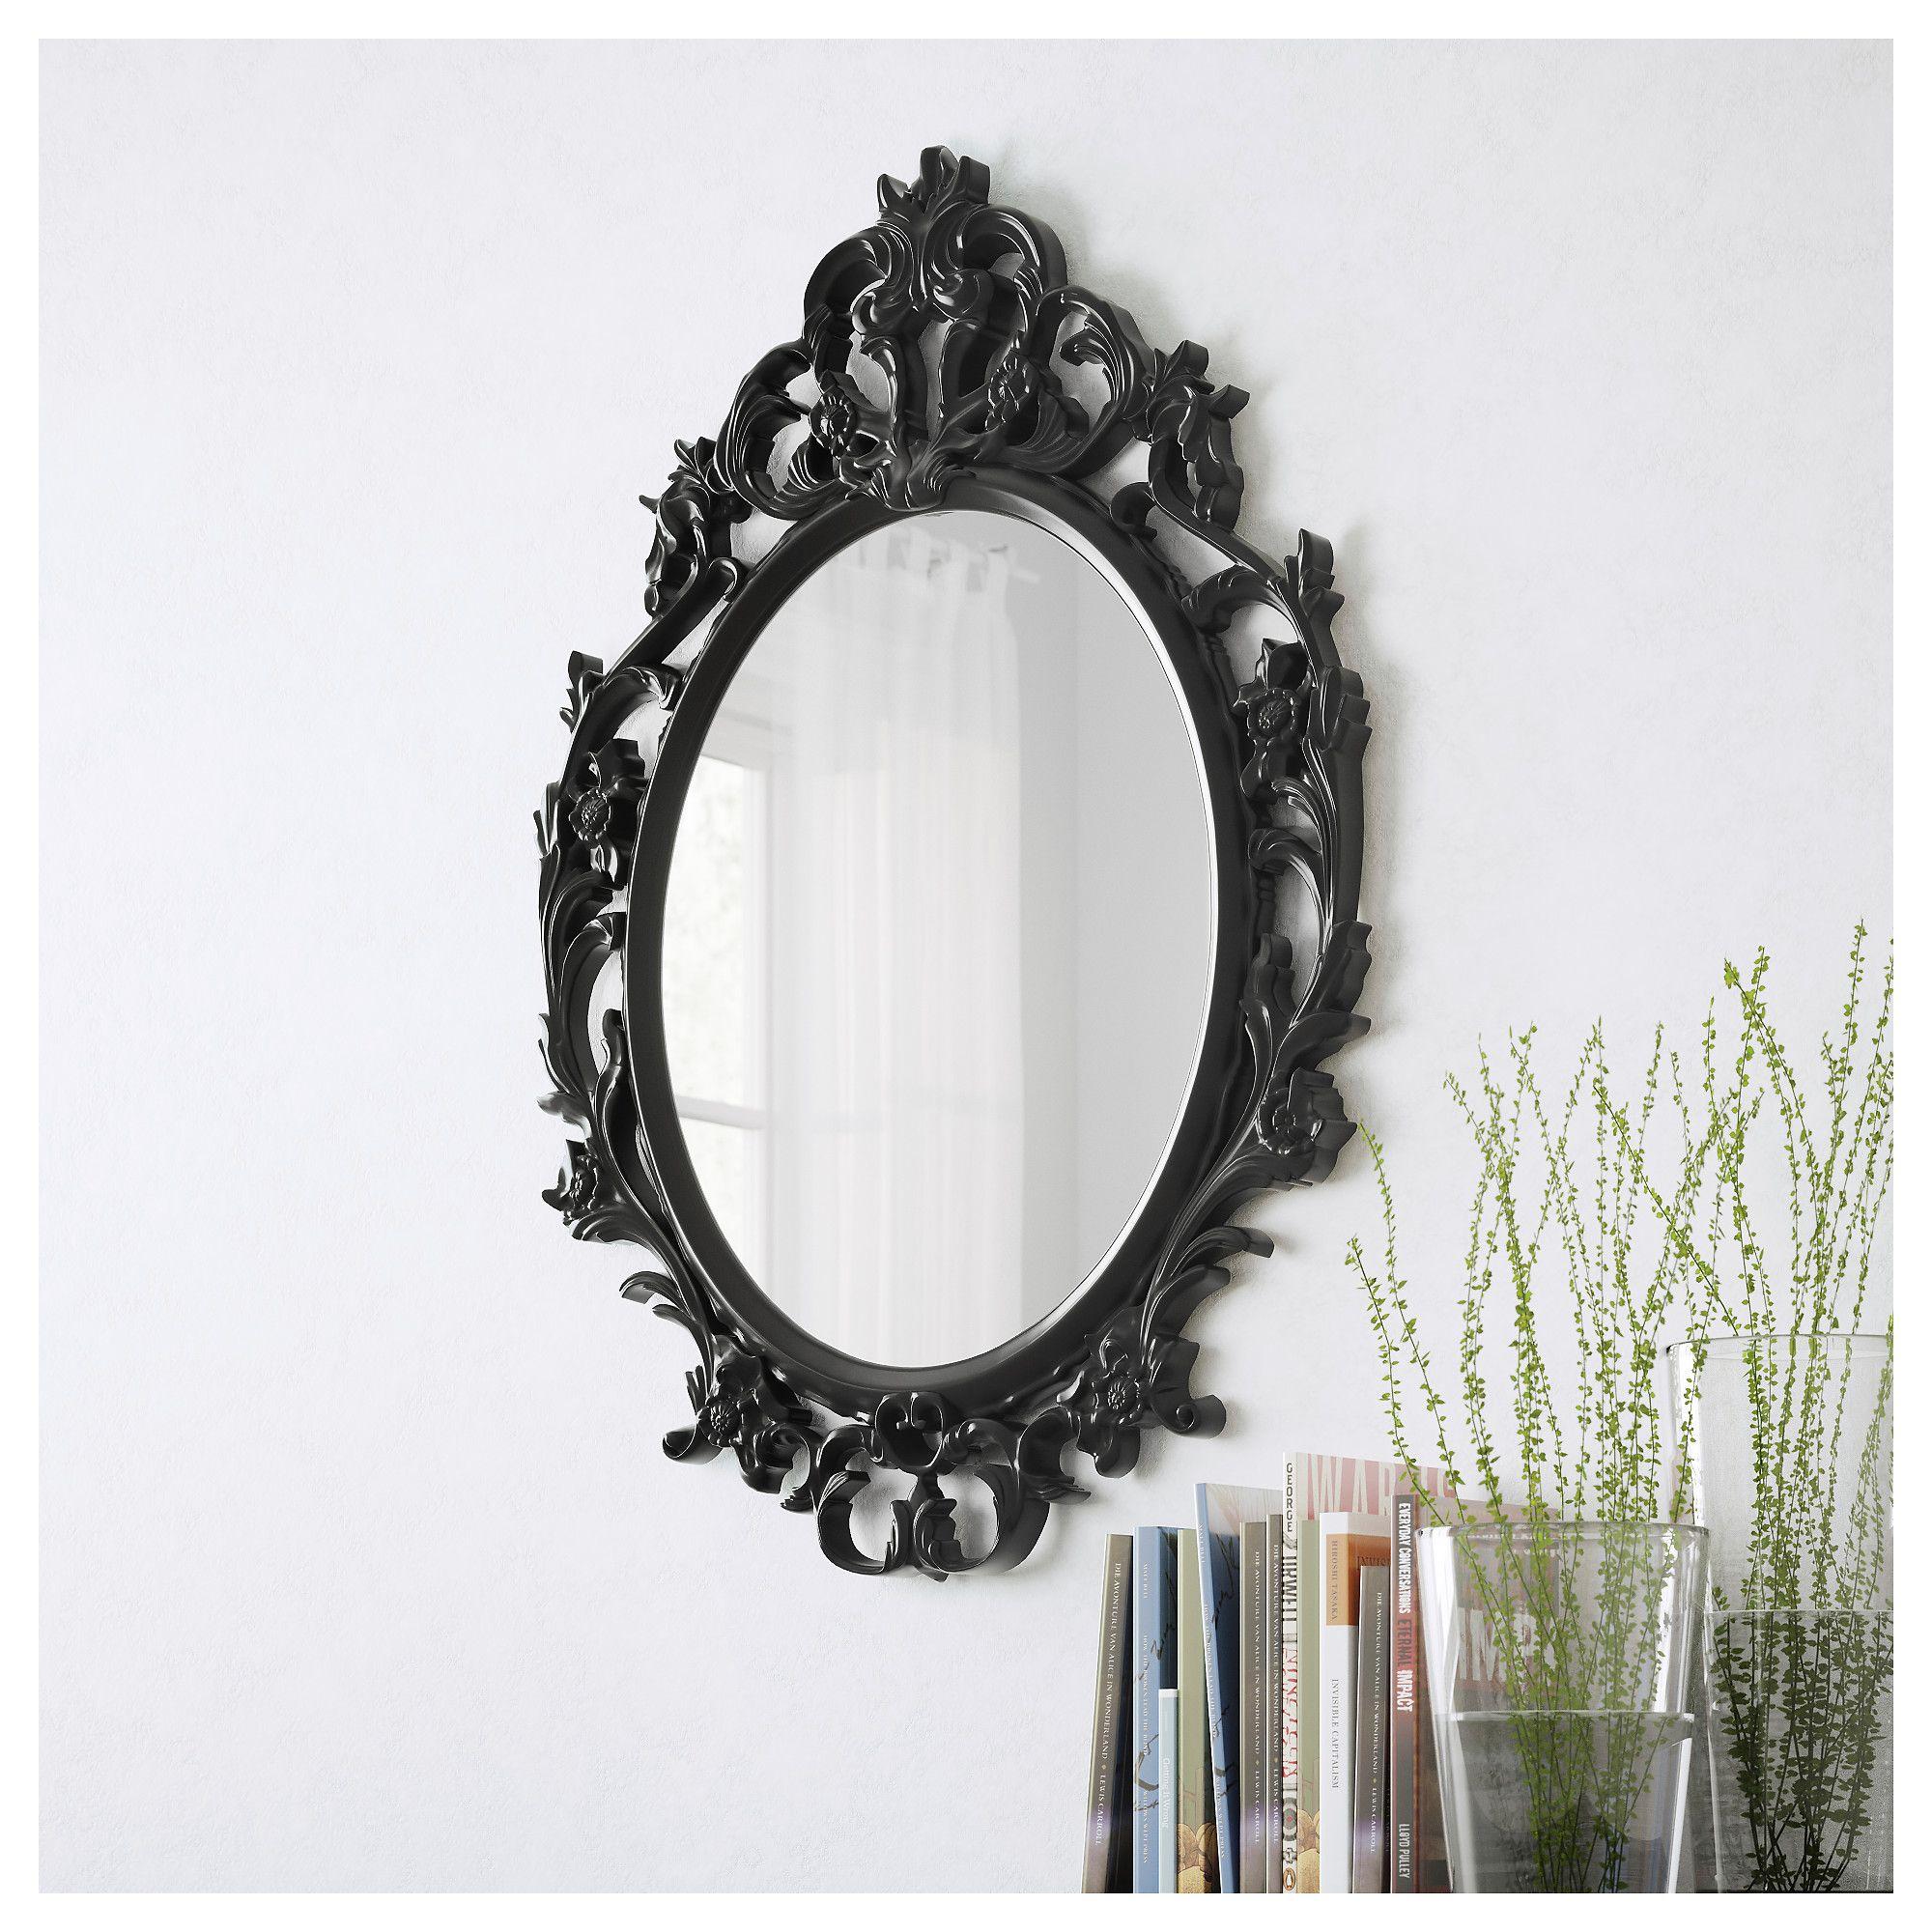 UNG DRILL Ogledalo ovalno crna